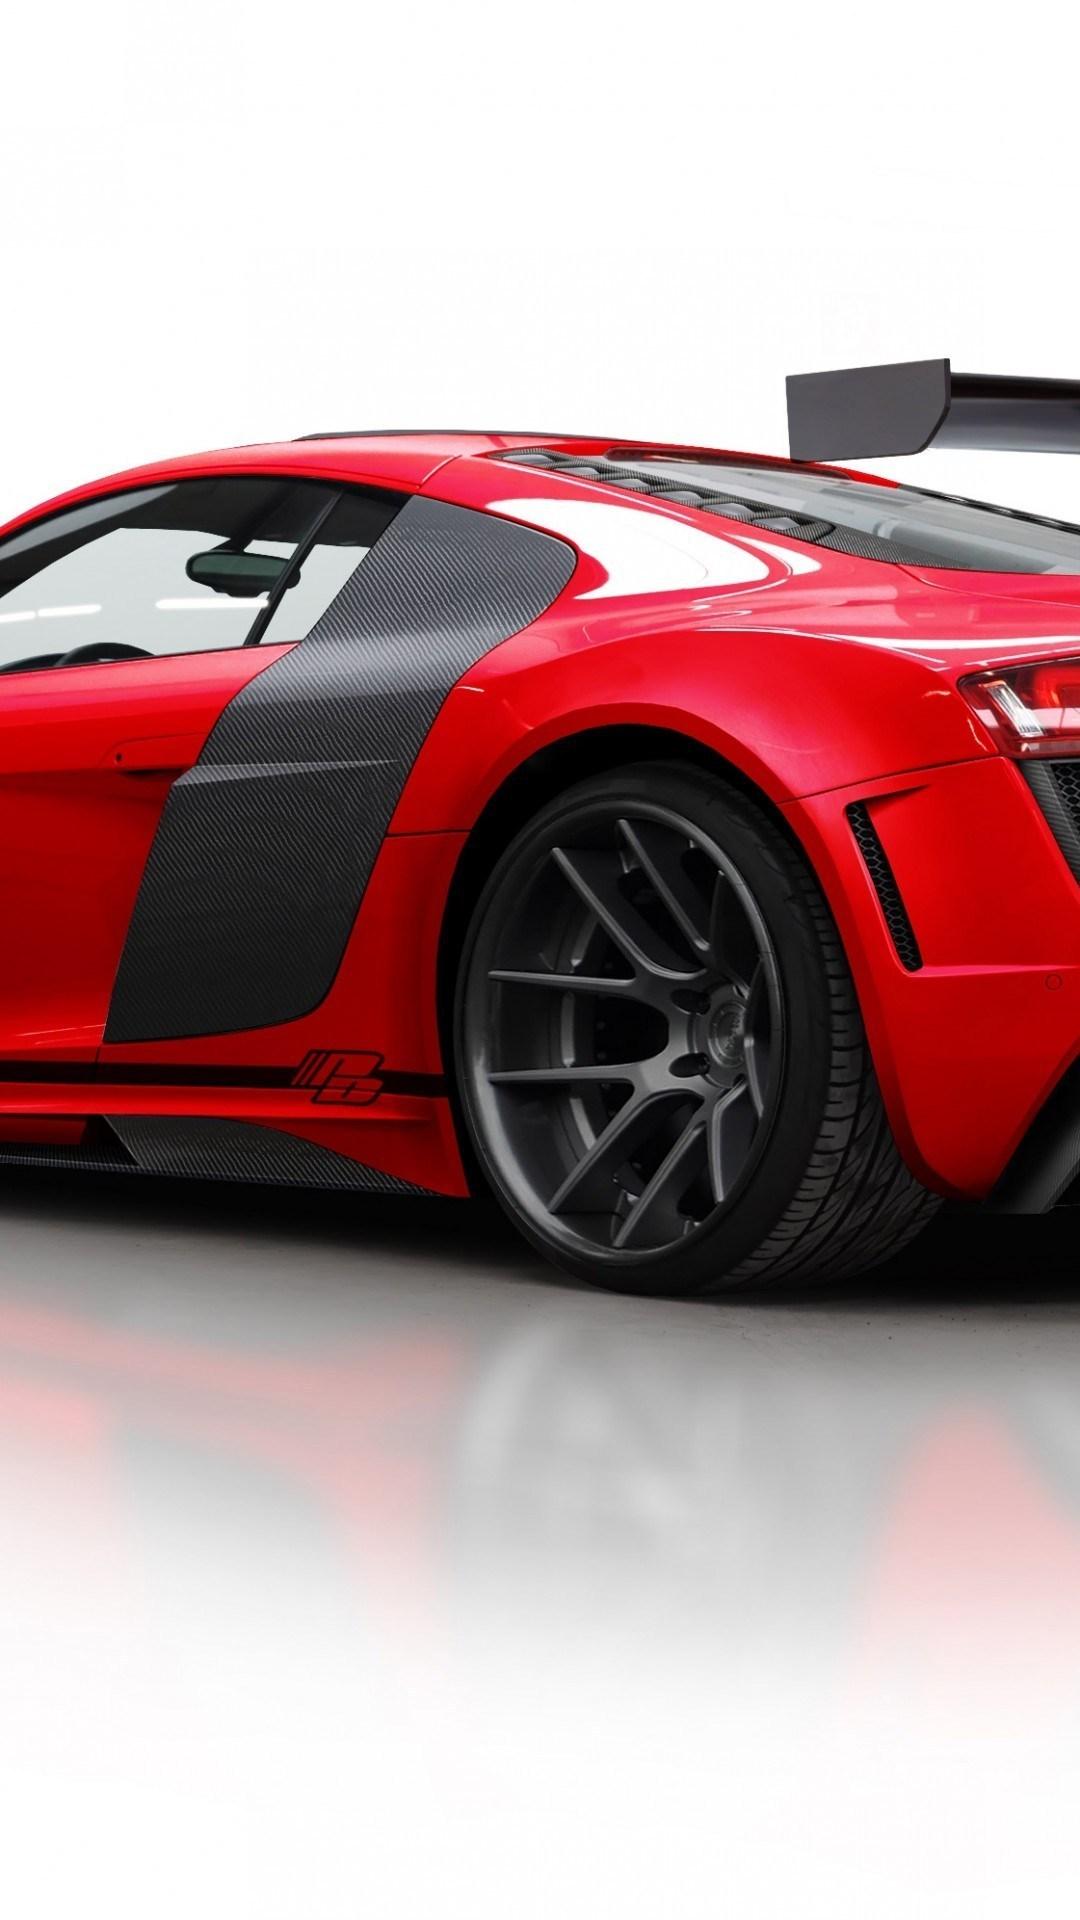 Tag For Audi R8 Car Pics Wallpaper Sportstyle Cool - Audi R8 Black Spoiler , HD Wallpaper & Backgrounds